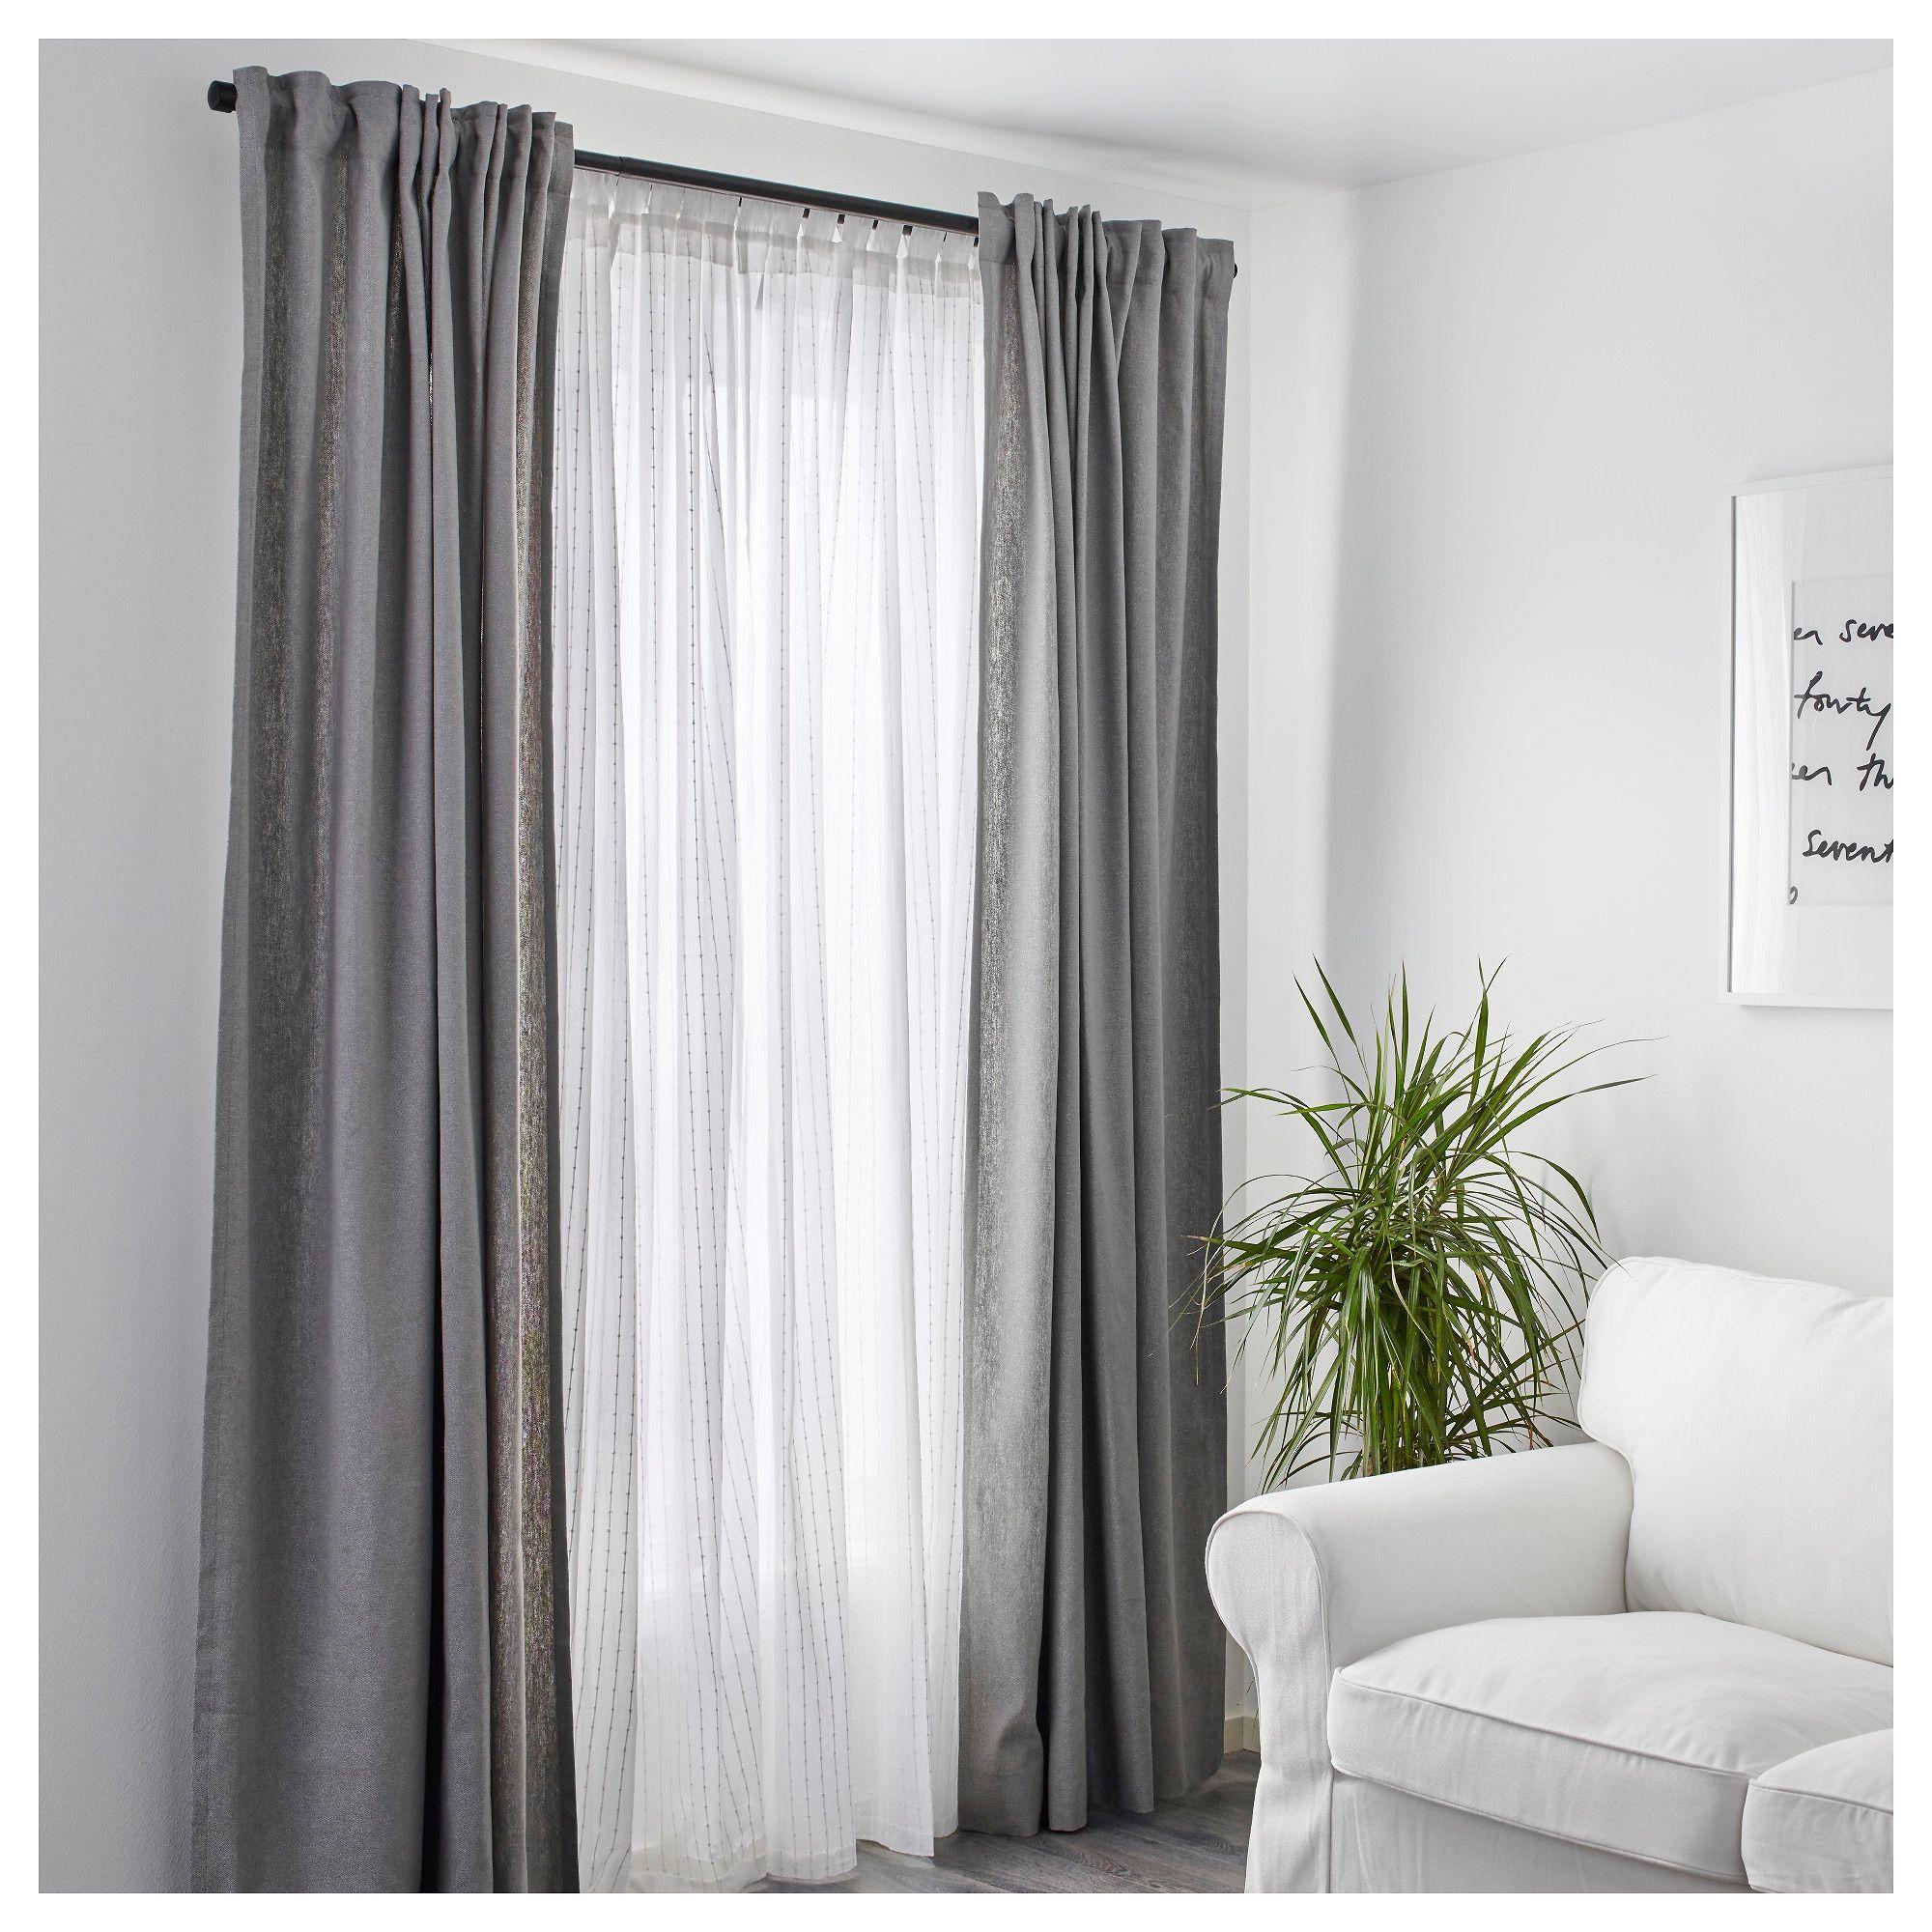 Matilda Sheer Curtains 1 Pair Ikea Nosewcurtains Oturma